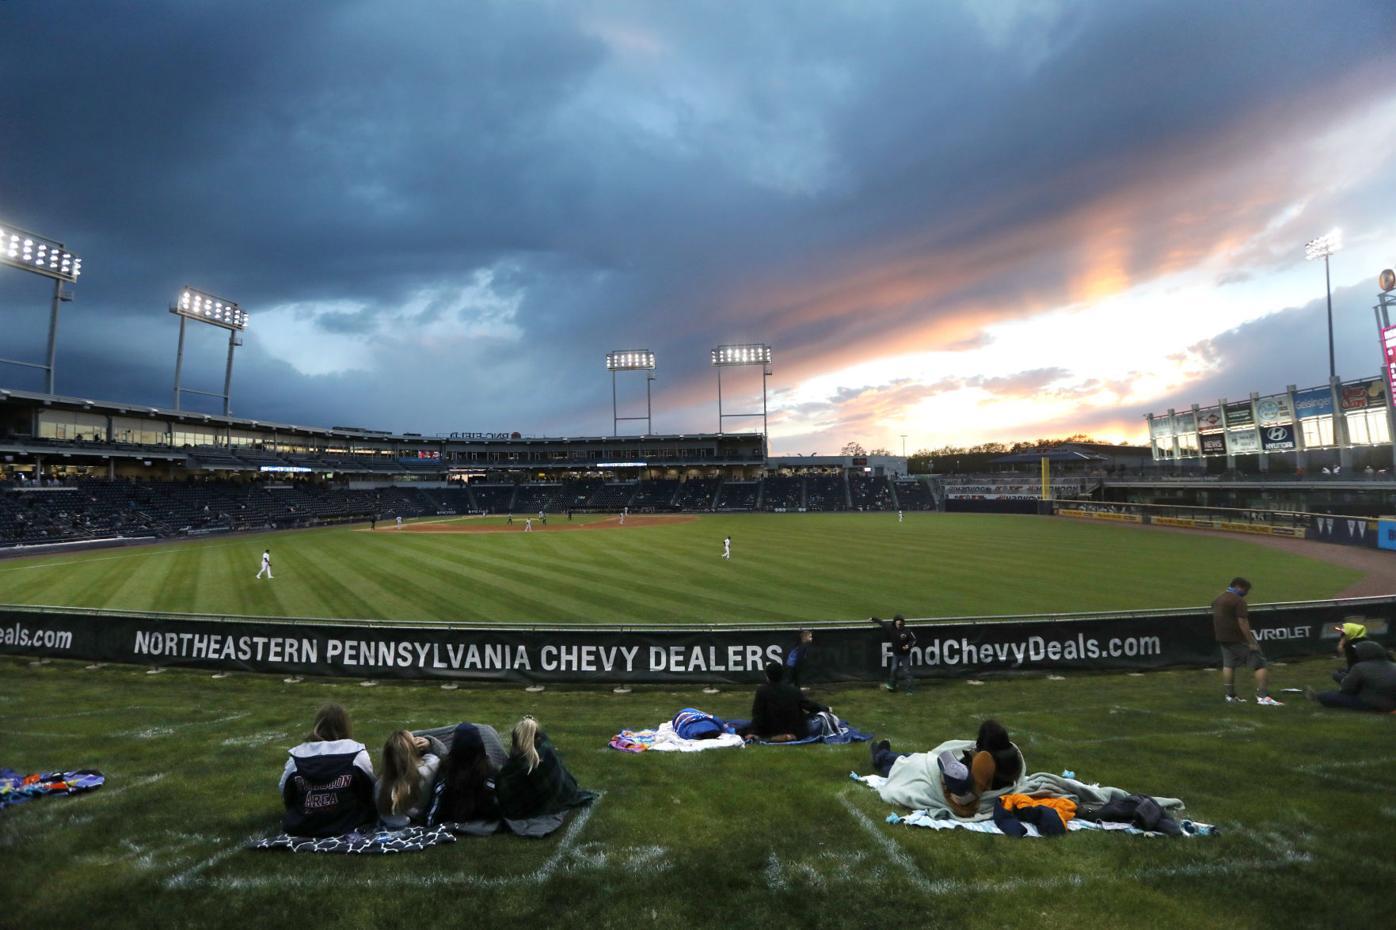 RailRiders home opener brings devoted fans back to ballpark